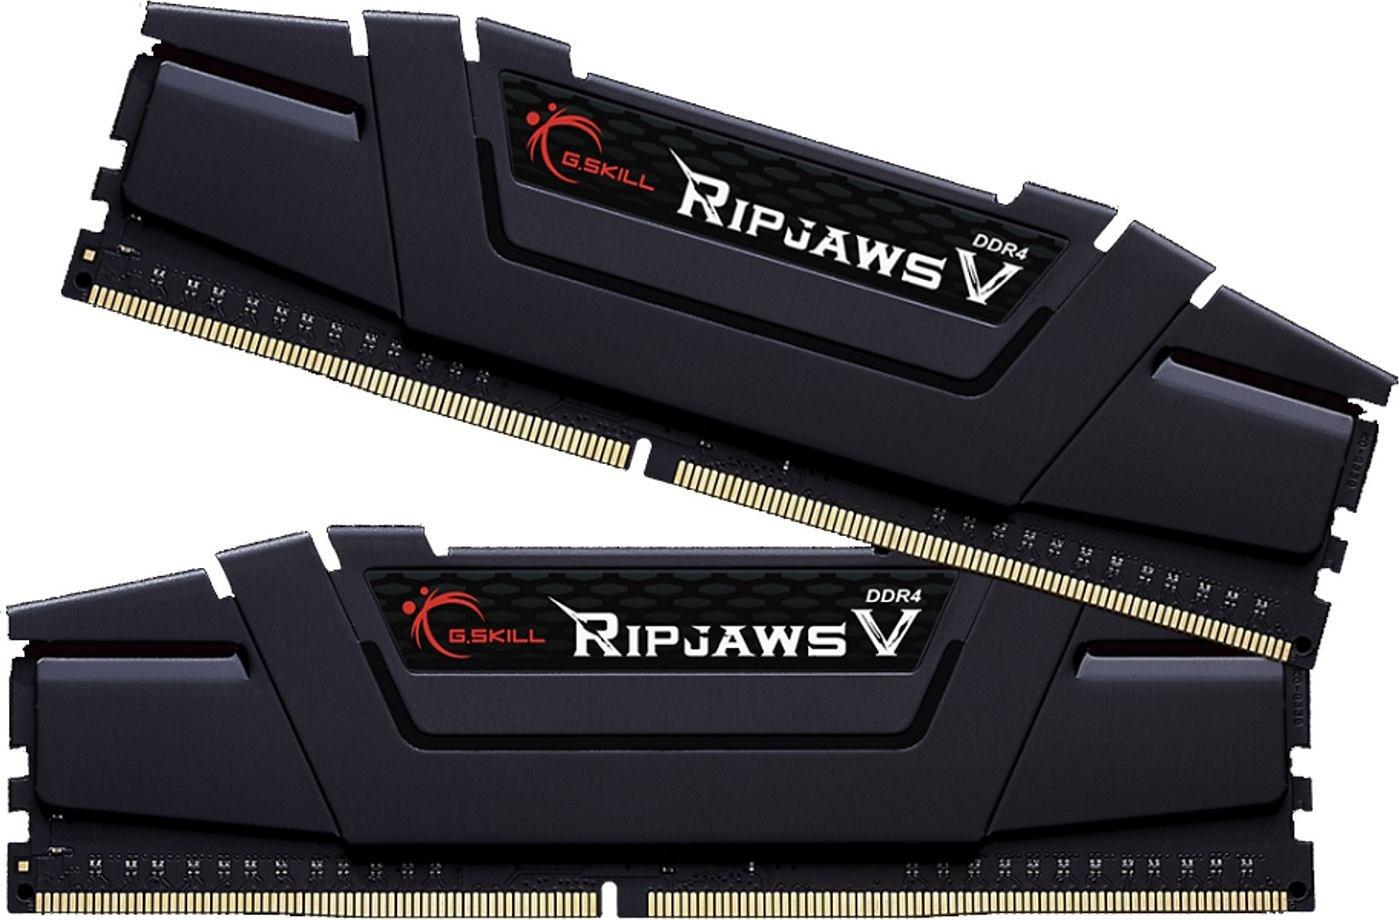 G.SKill Ripjaws V 16GB Black DDR4-3600 Kit CL16 für 32,23€ (Amazon IT)